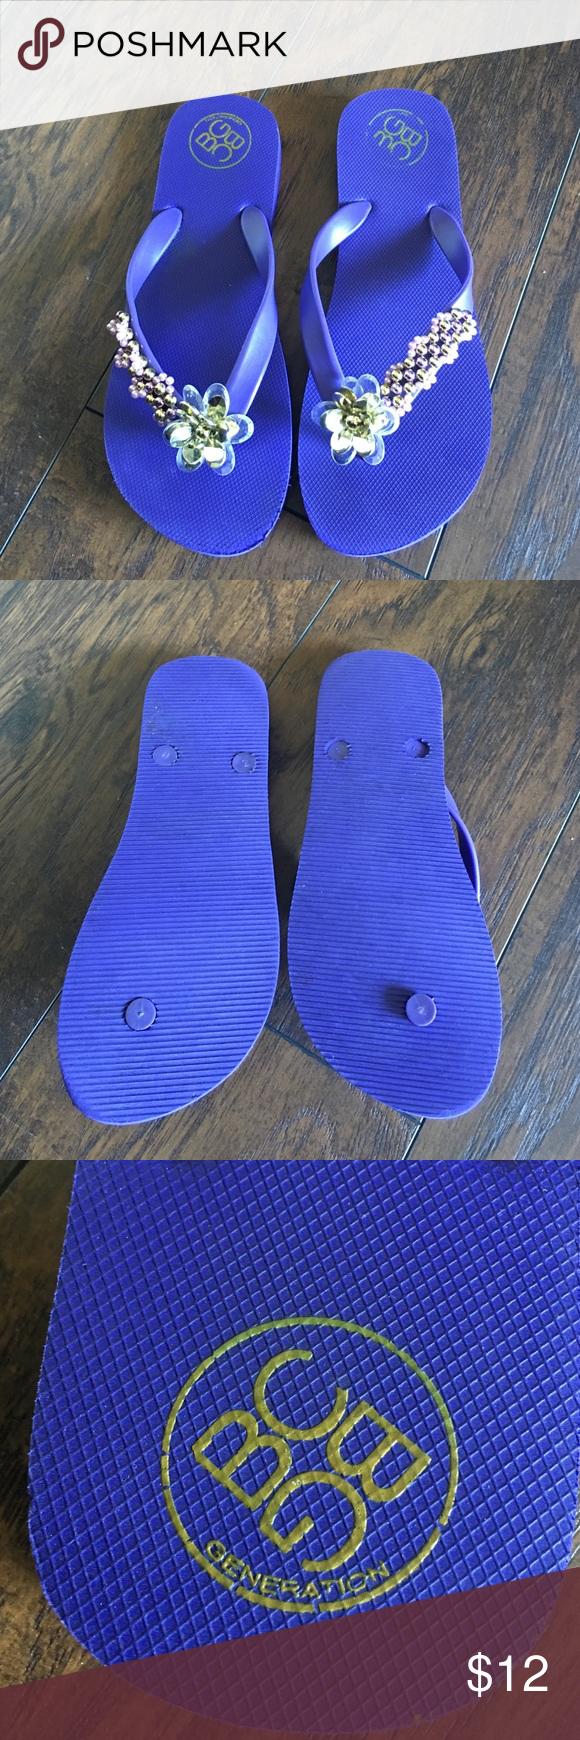 Bcbgeneration flip flops Worn a few times but great condition.  Shows little wear.  Cute beaded design BCBGeneration Shoes Sandals